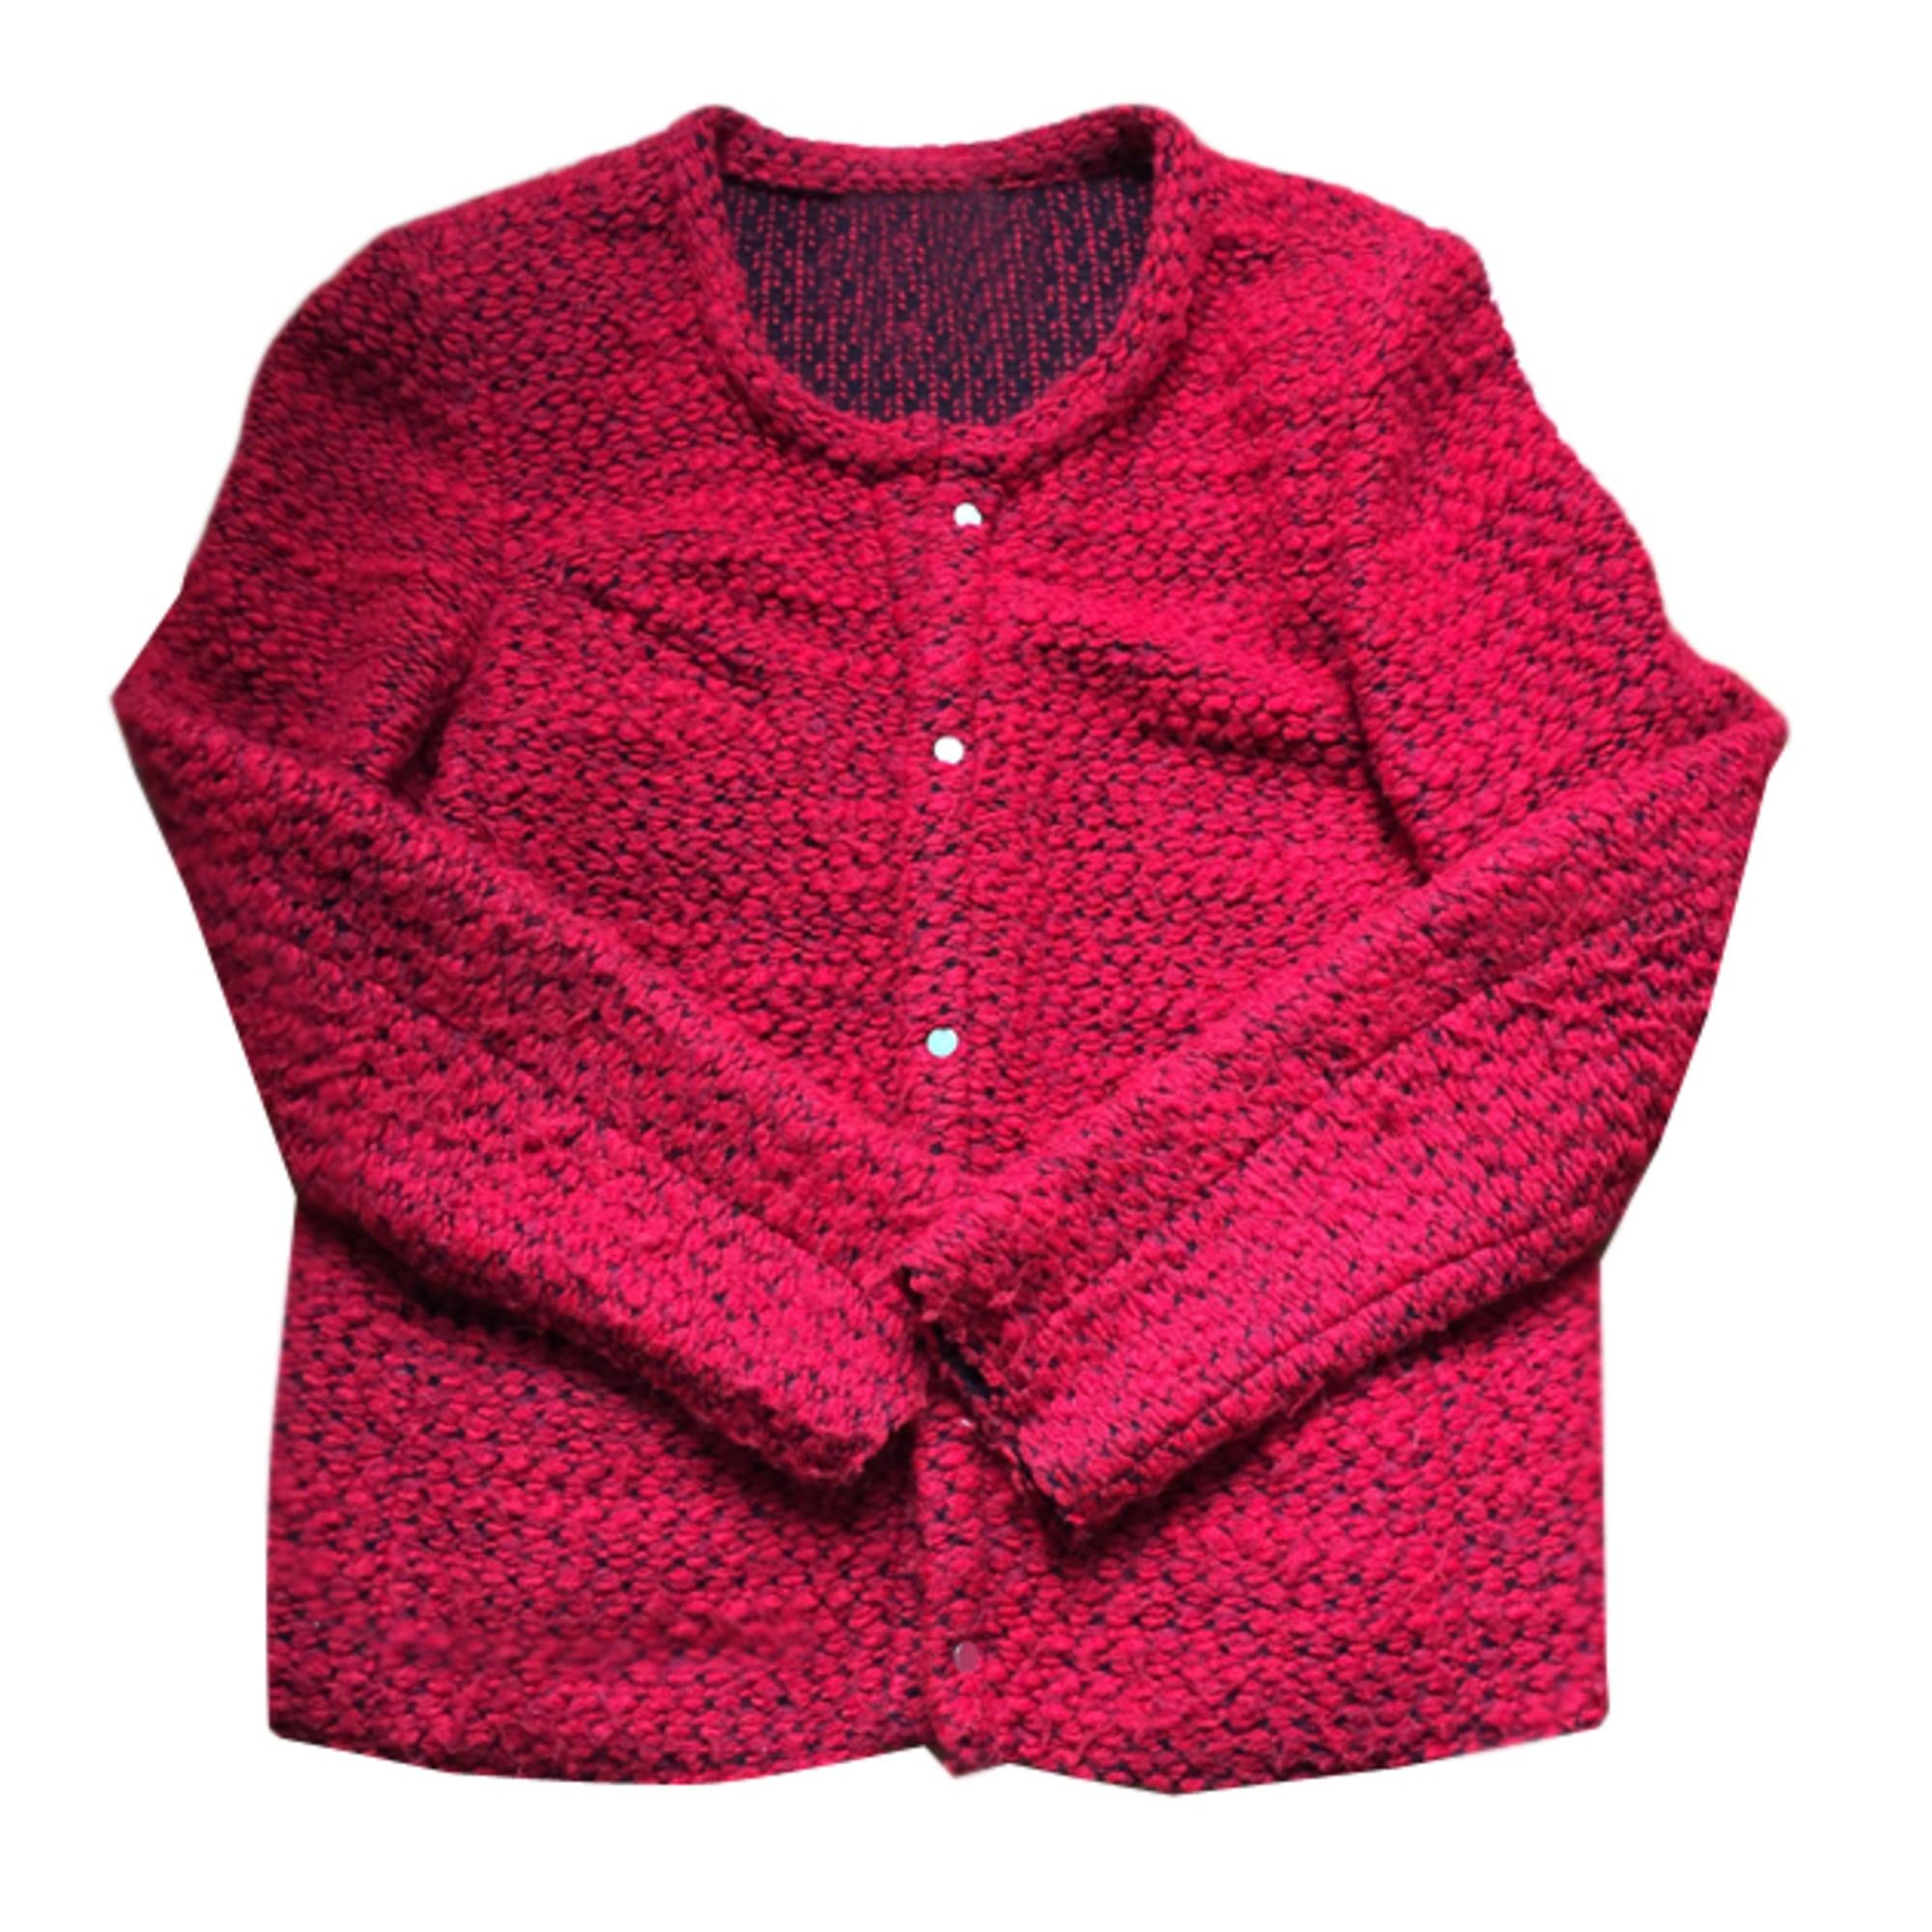 giacca iro 38 m t2 rosso vendu par le vide dressing de 4256364. Black Bedroom Furniture Sets. Home Design Ideas